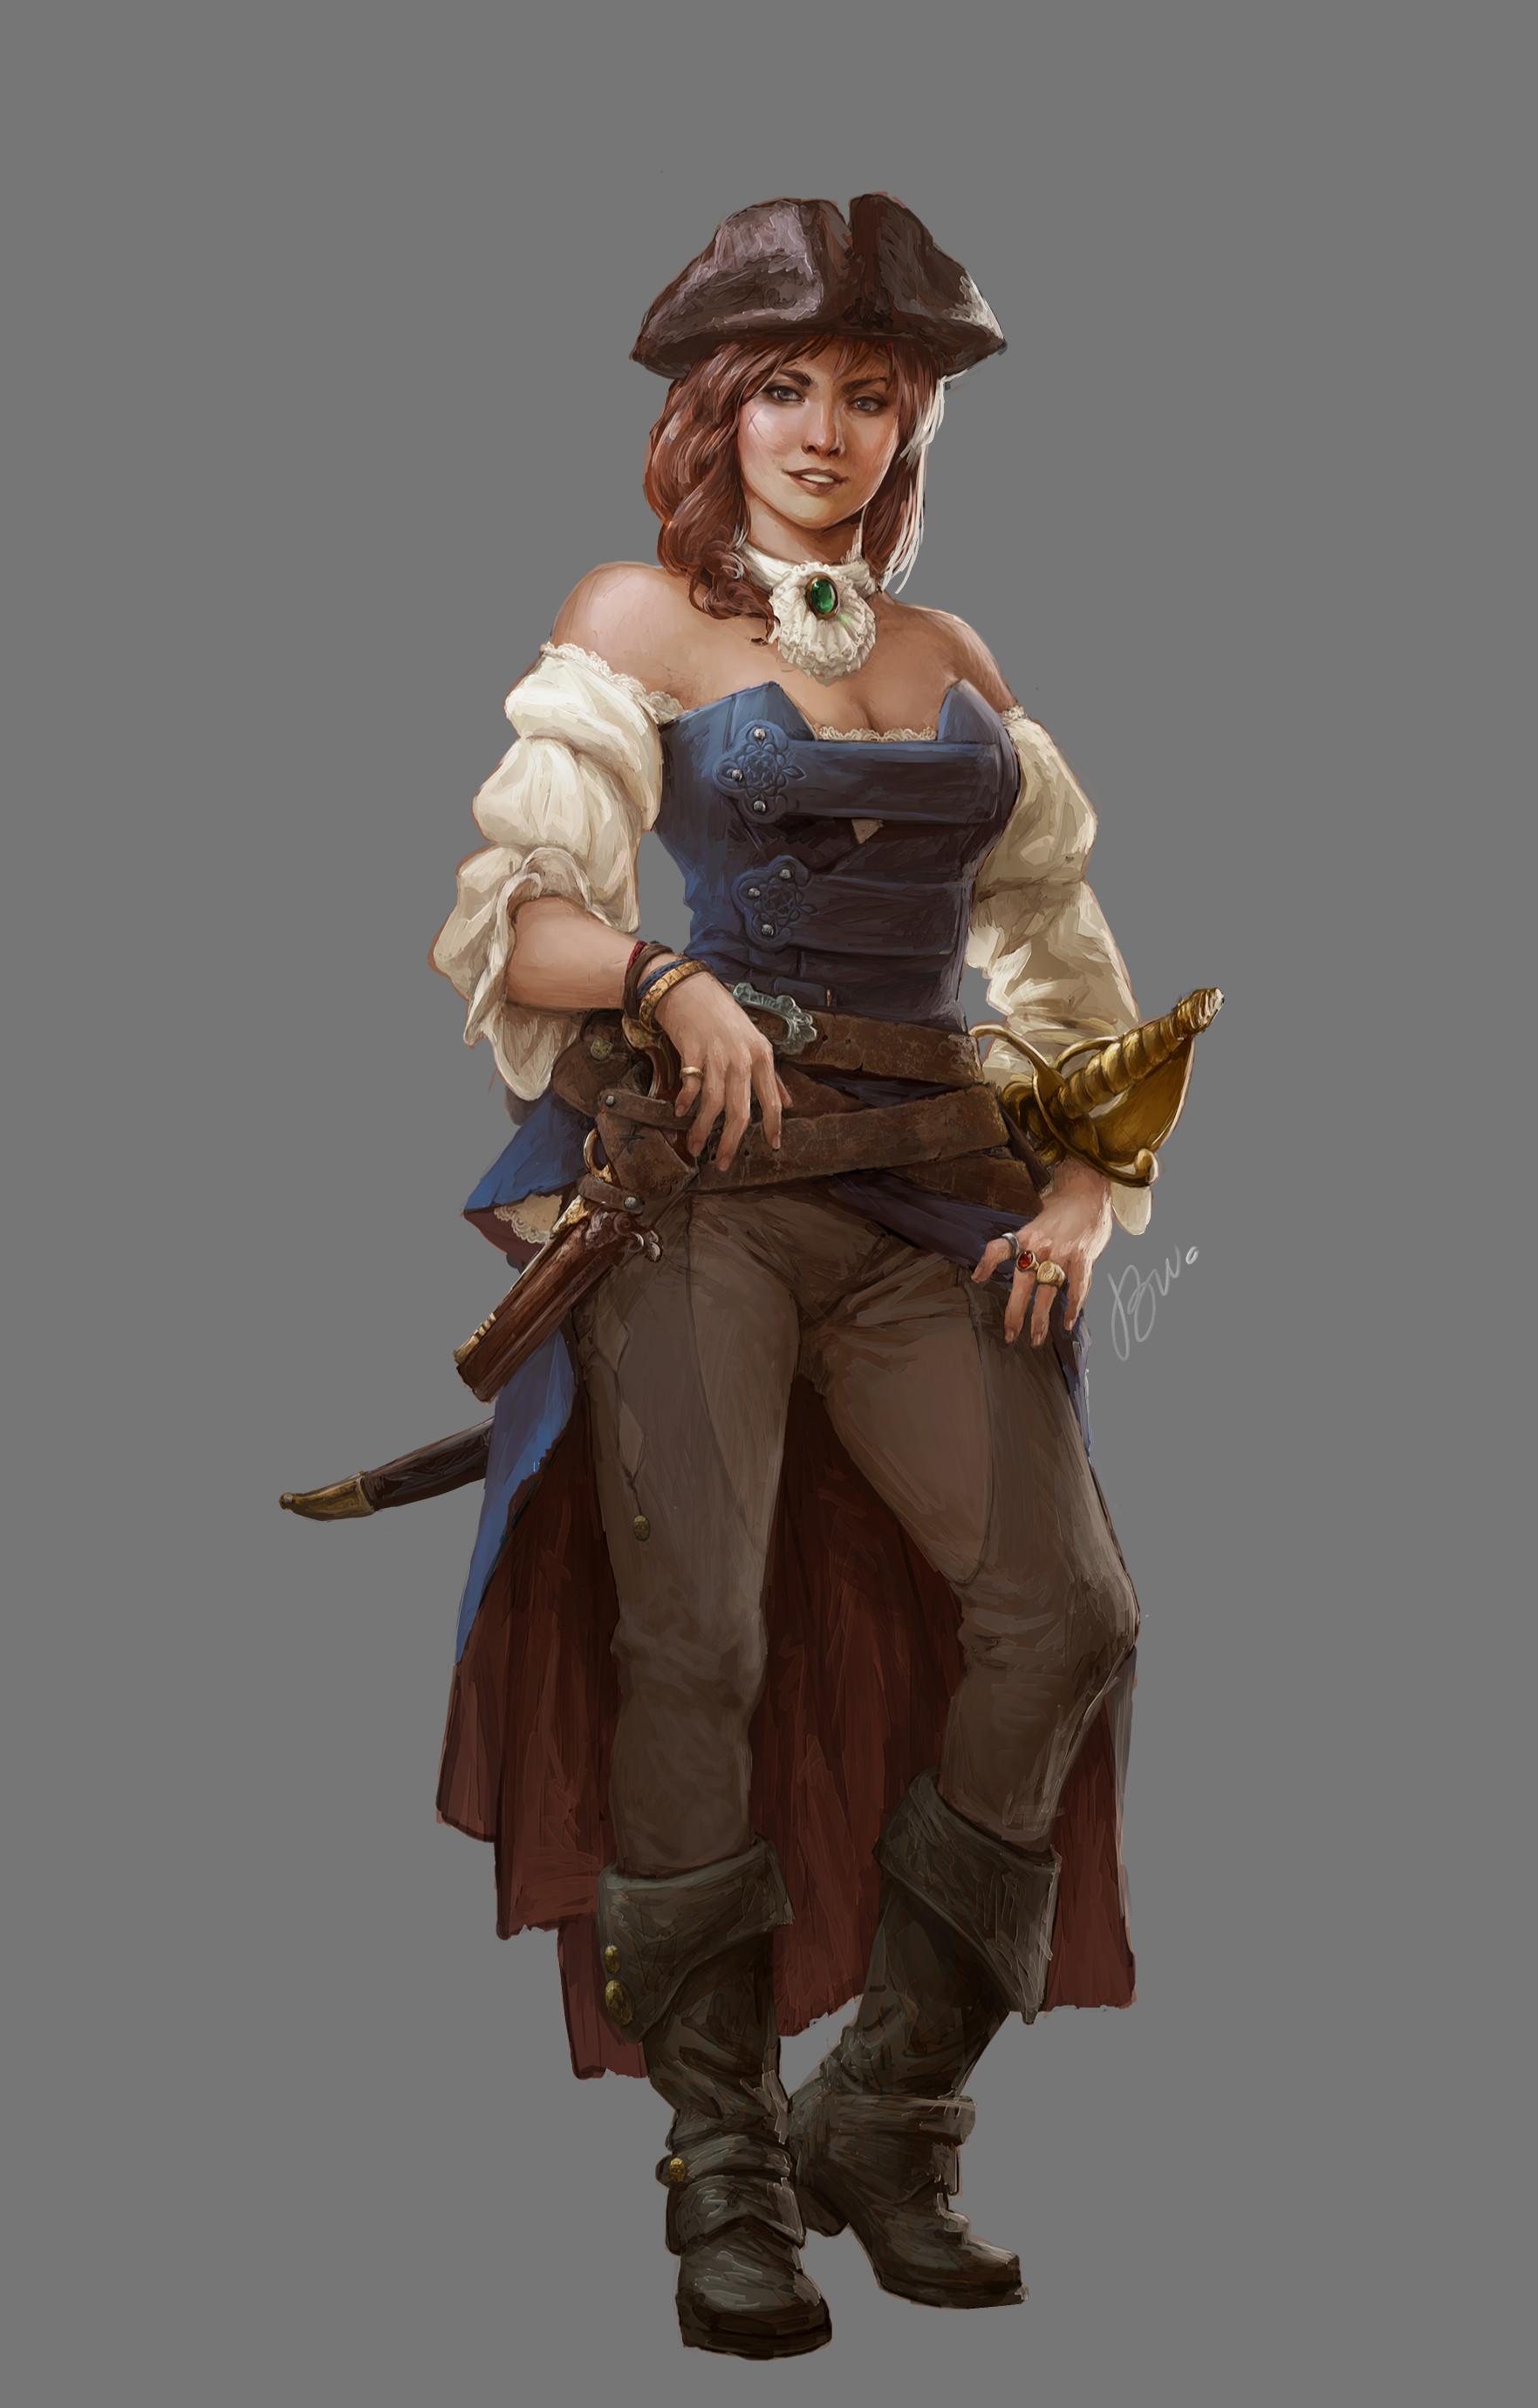 Brenda van vugt tutorialgirl piratesgame